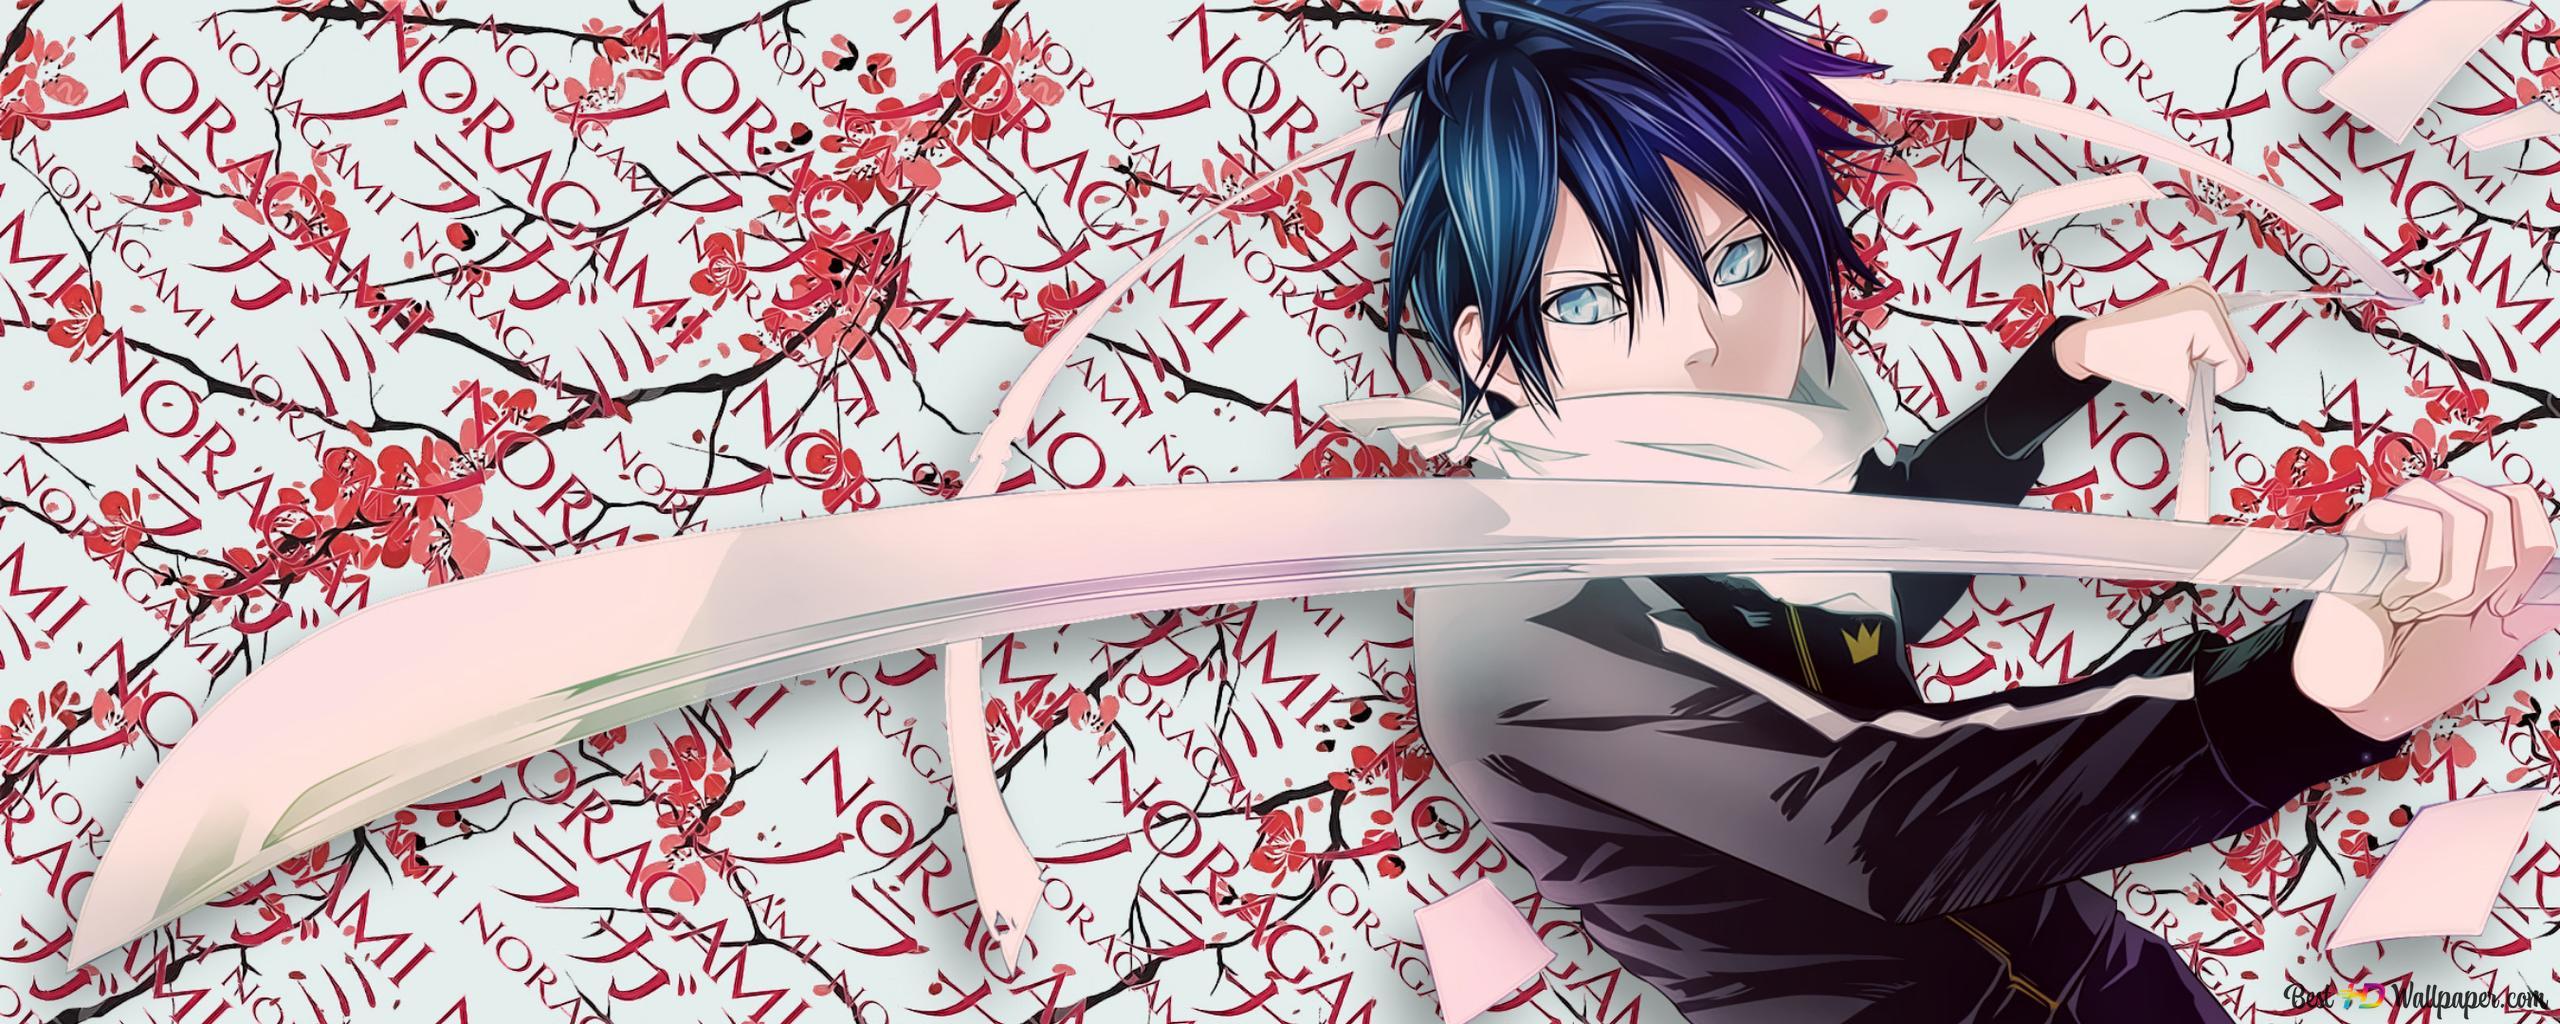 Noragami Yato God Of Depravity Hd Wallpaper Download